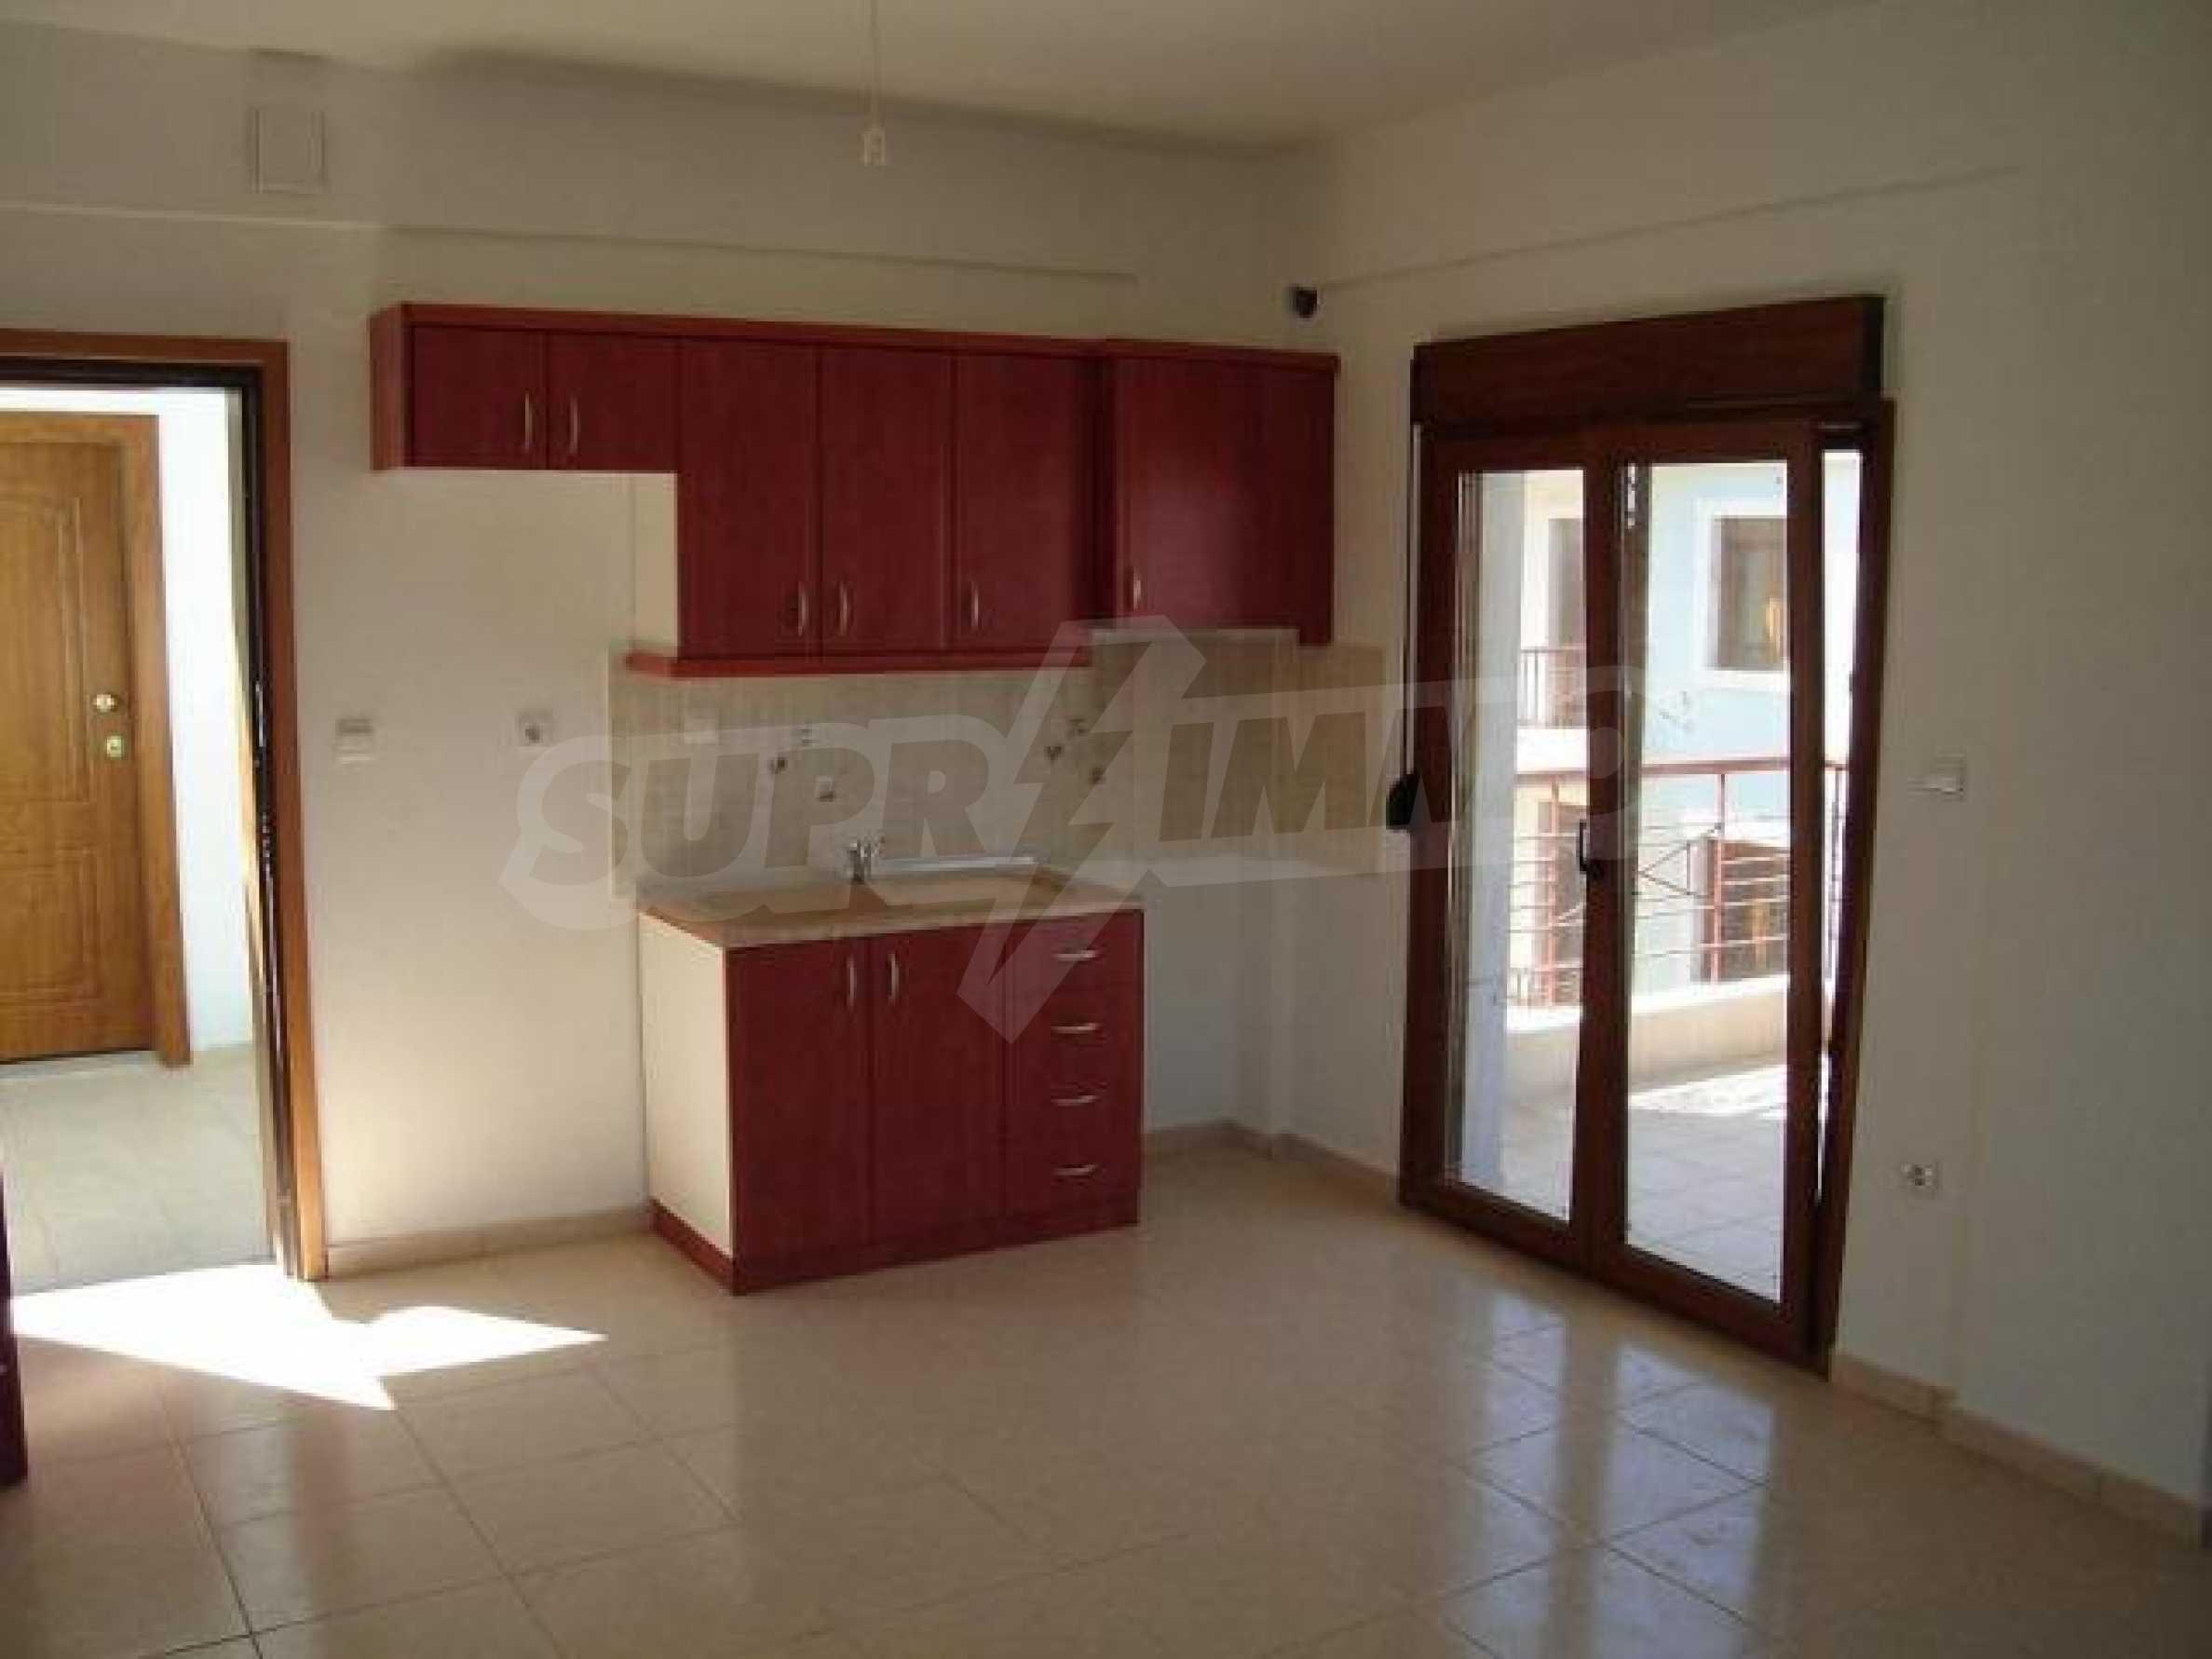 Двустаен апартамент в Афитос, Халкидики 4